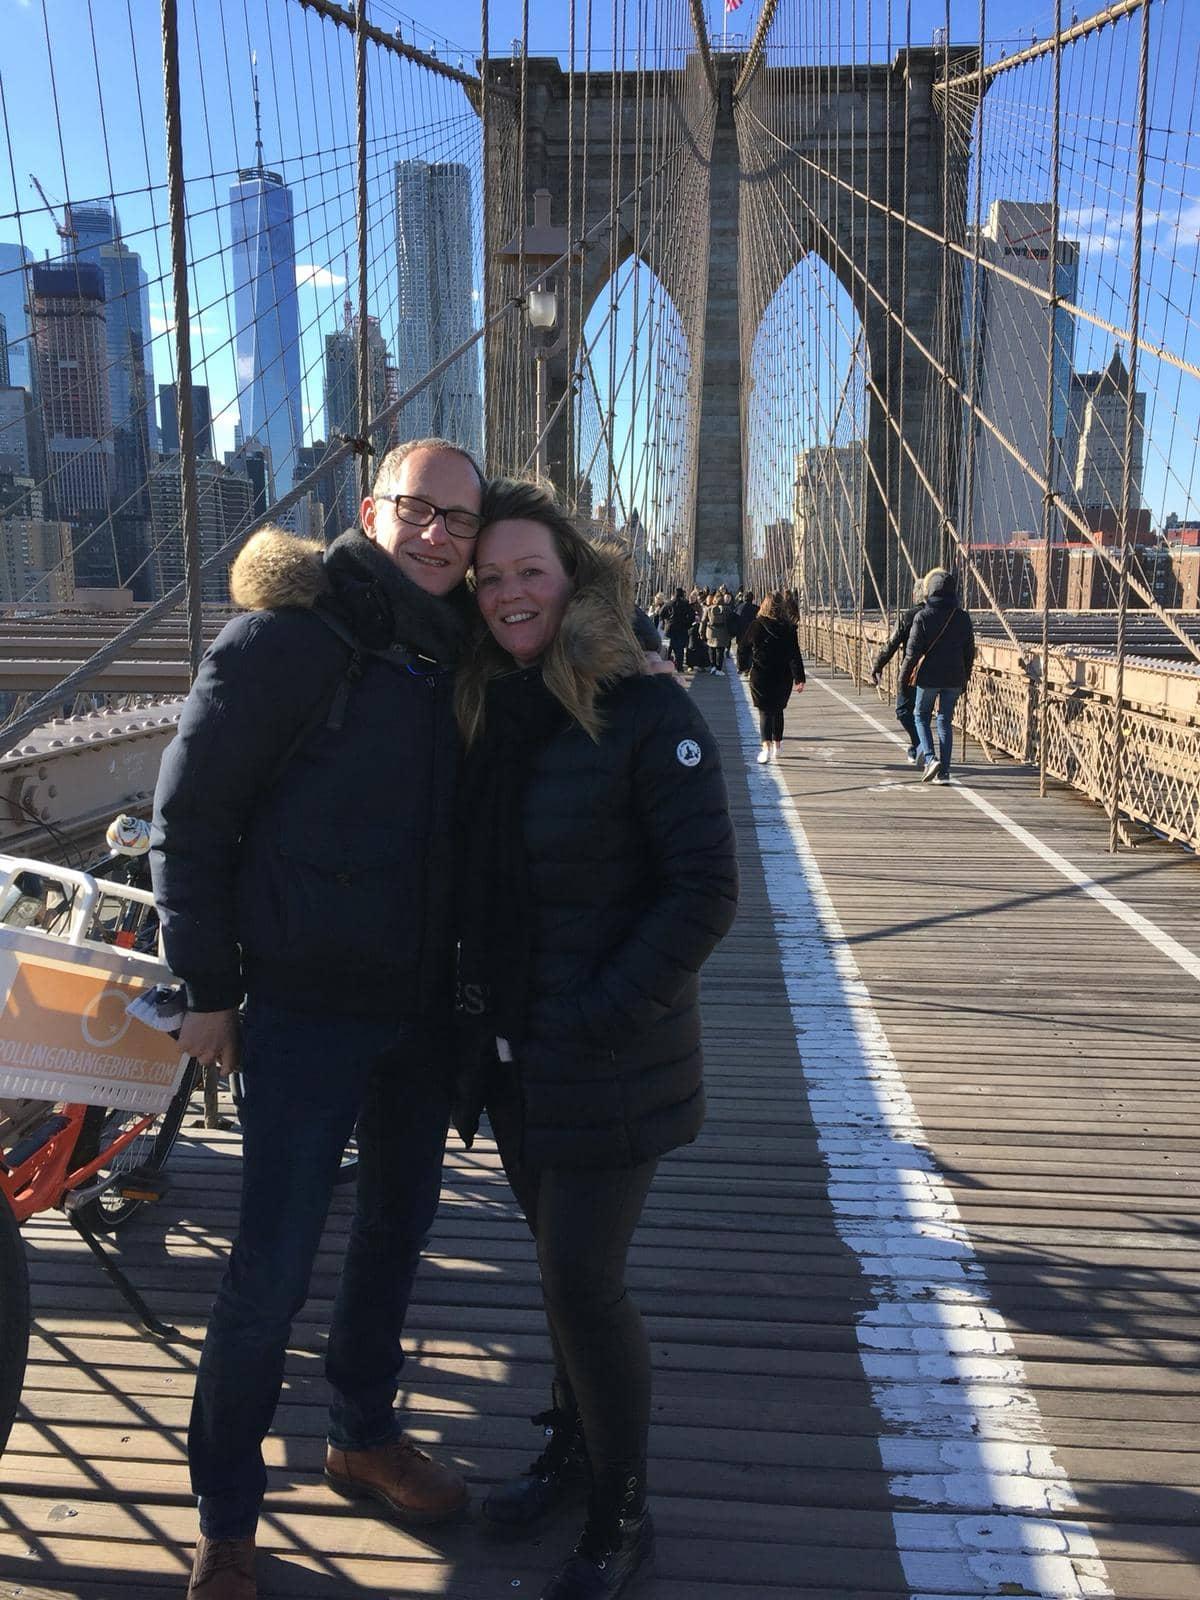 Vind en rejse til New York - Brooklyn Bridge